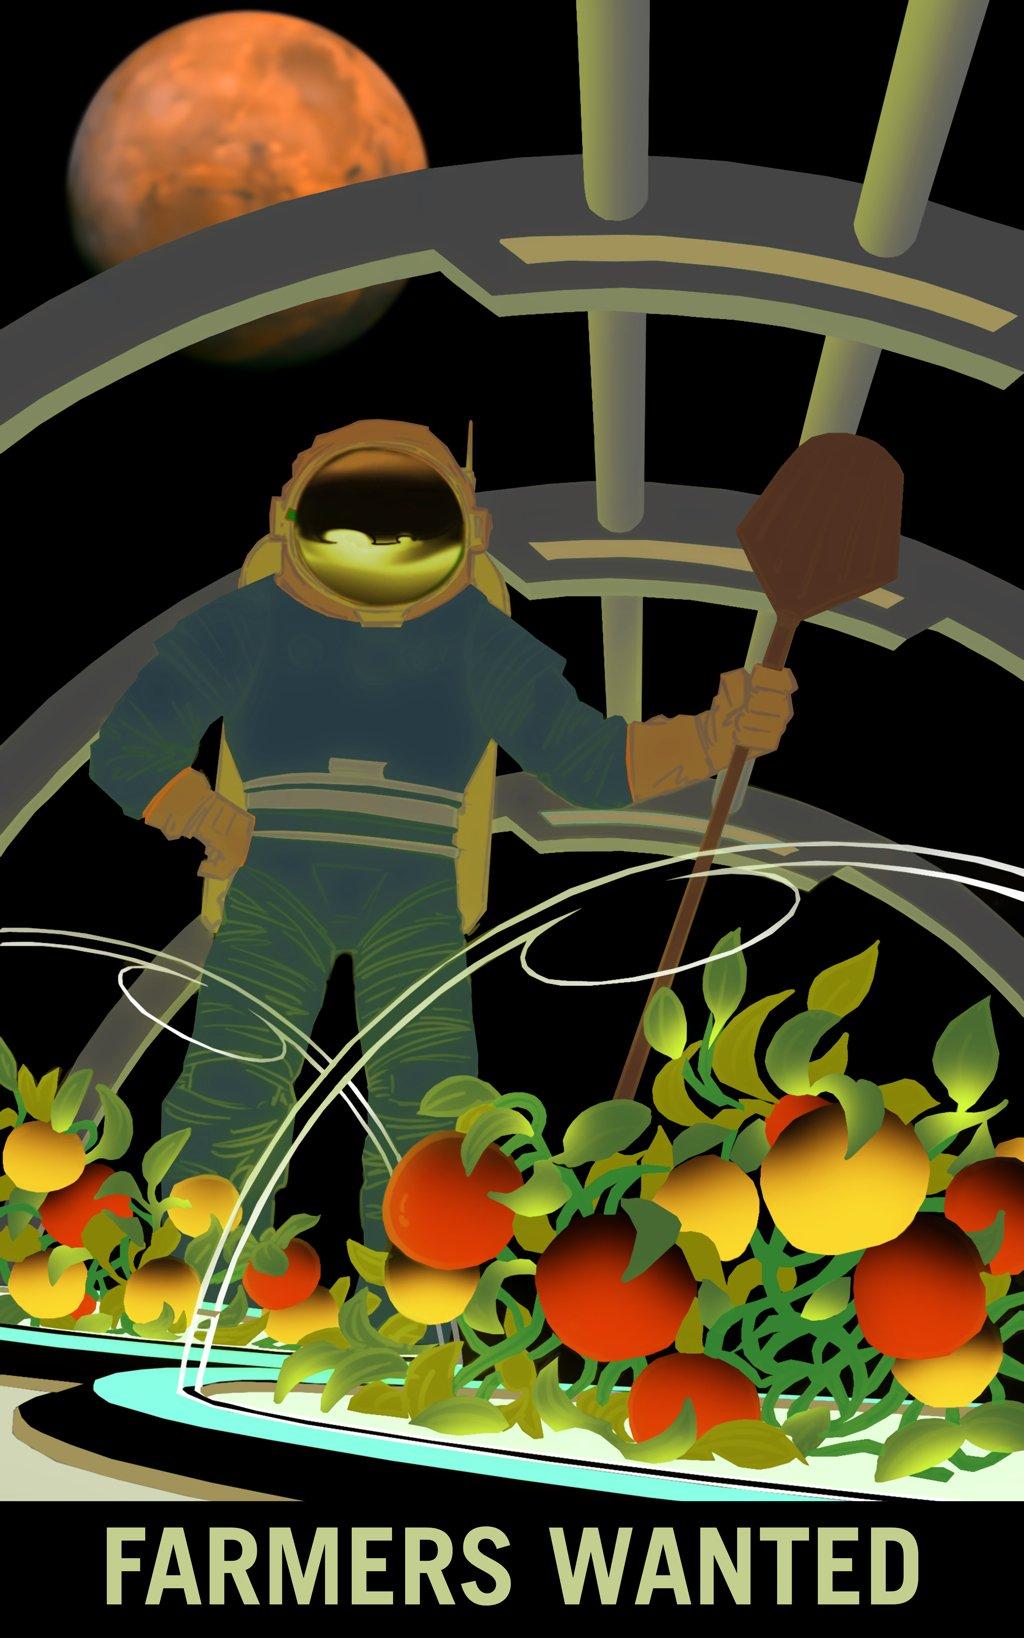 06142016-mars-farmers